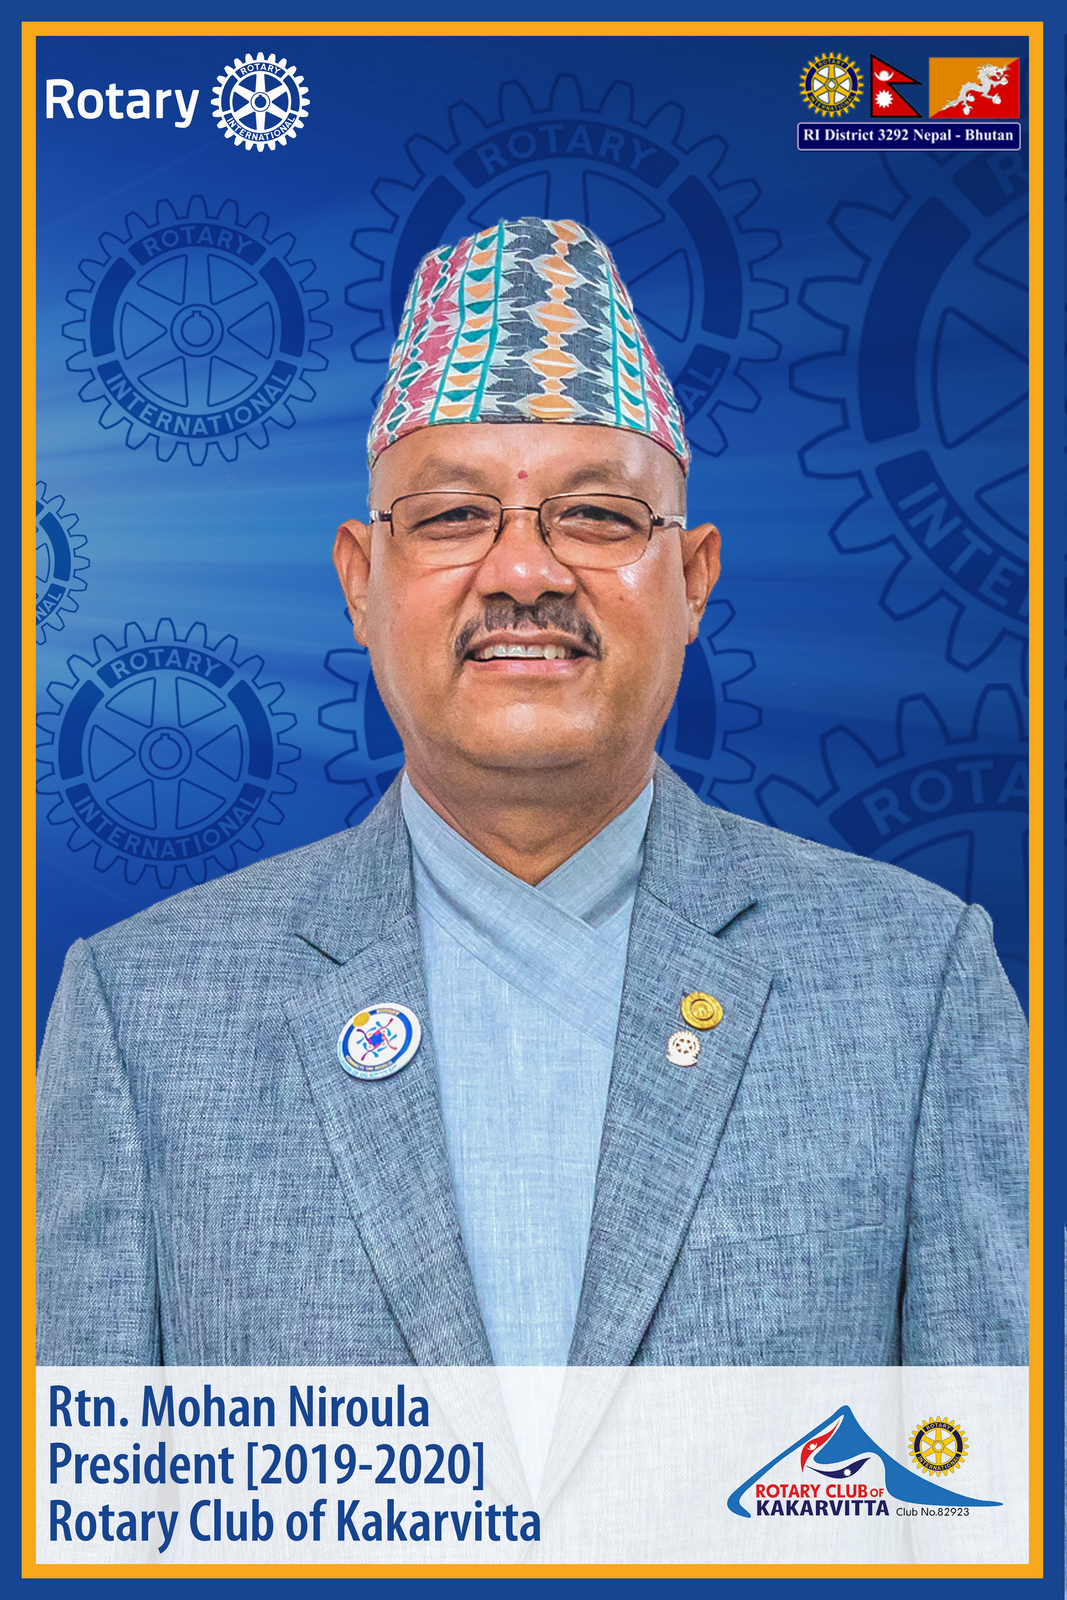 Rtn.-Mohan-Niroula-President-2019-20-Rotary-Club-of-Kakarvitta